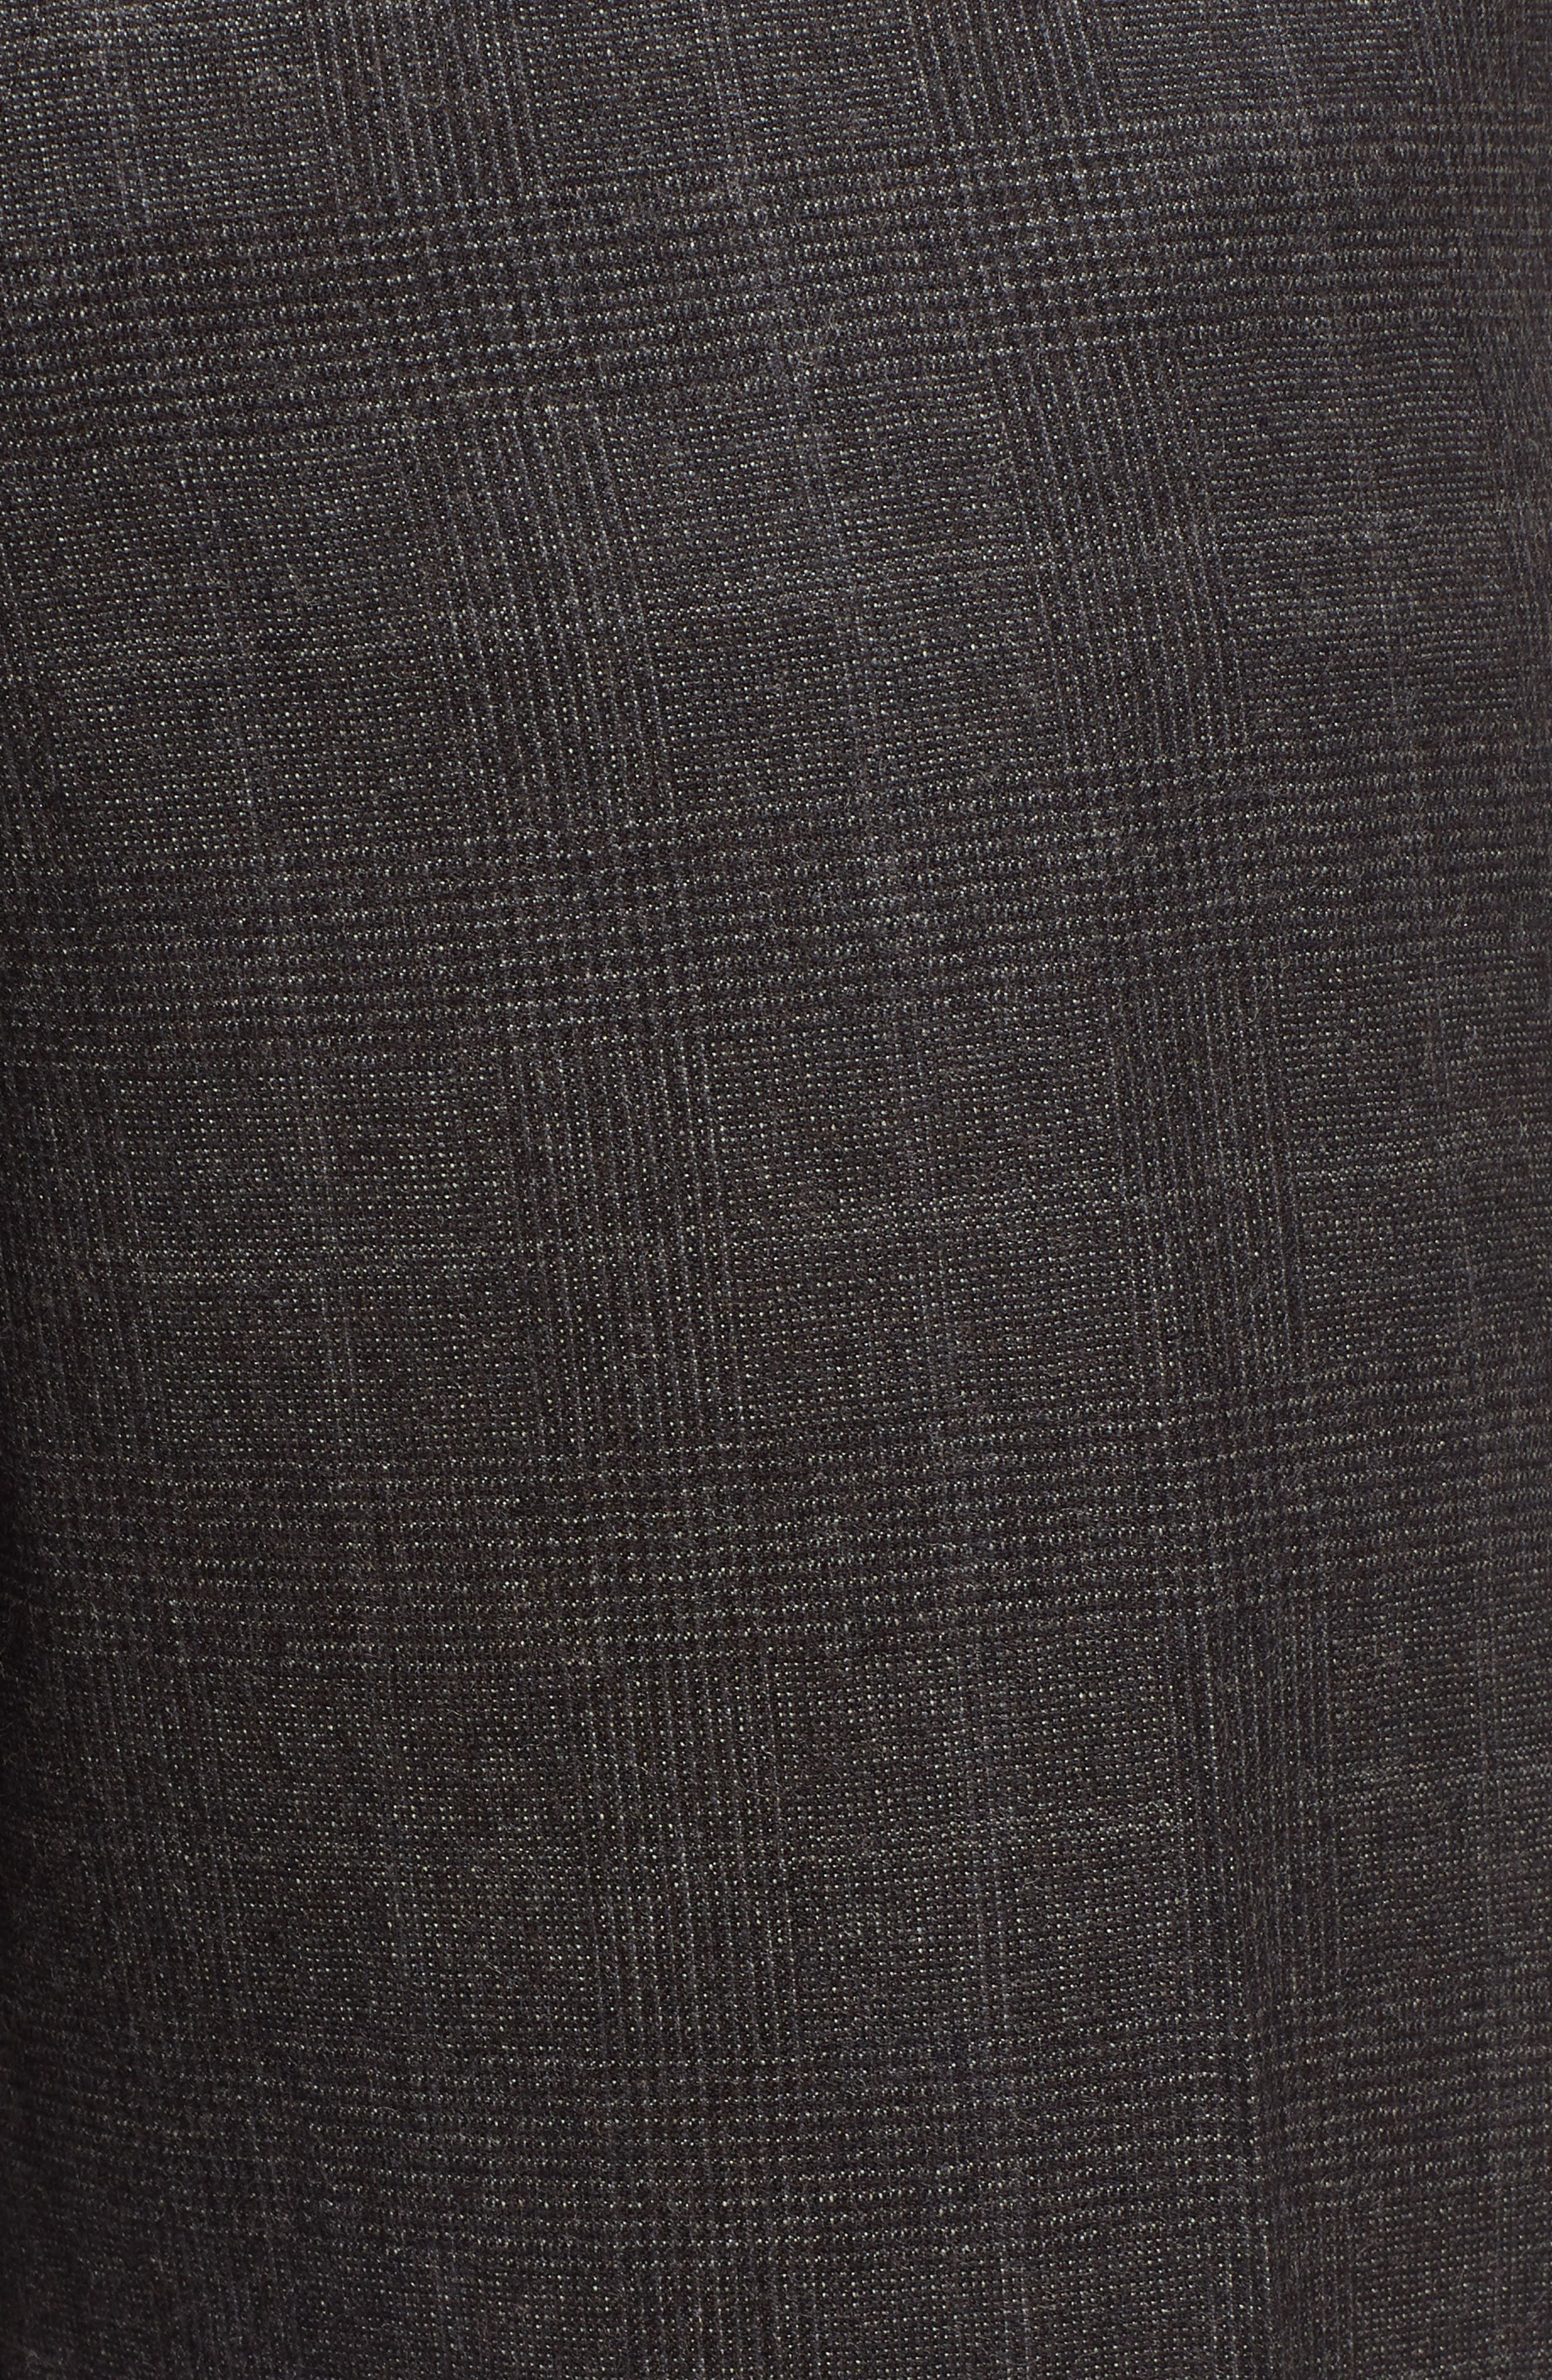 Trim Fit Flat Front Wool Trousers,                             Alternate thumbnail 5, color,                             BLACK